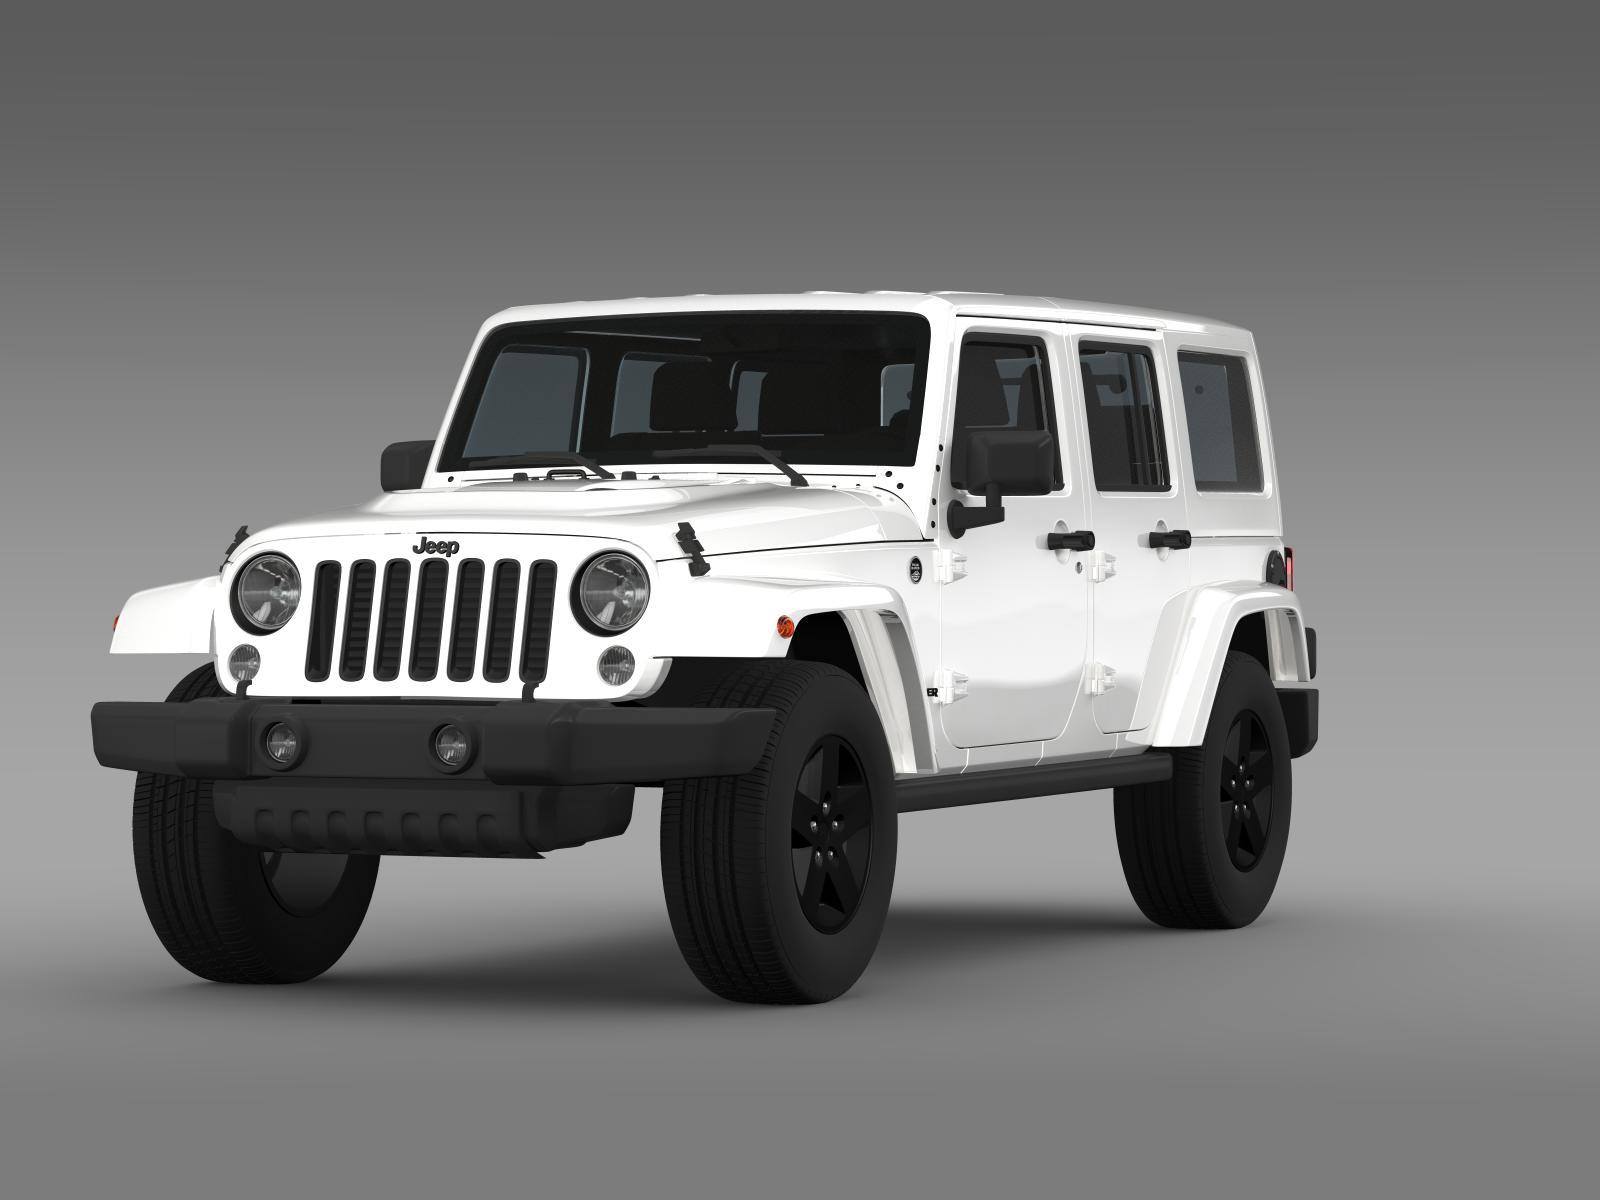 jeep wrangler unlimited 2015. jeep wrangler unlimited x 2015 9671kb jpg by creator_3d